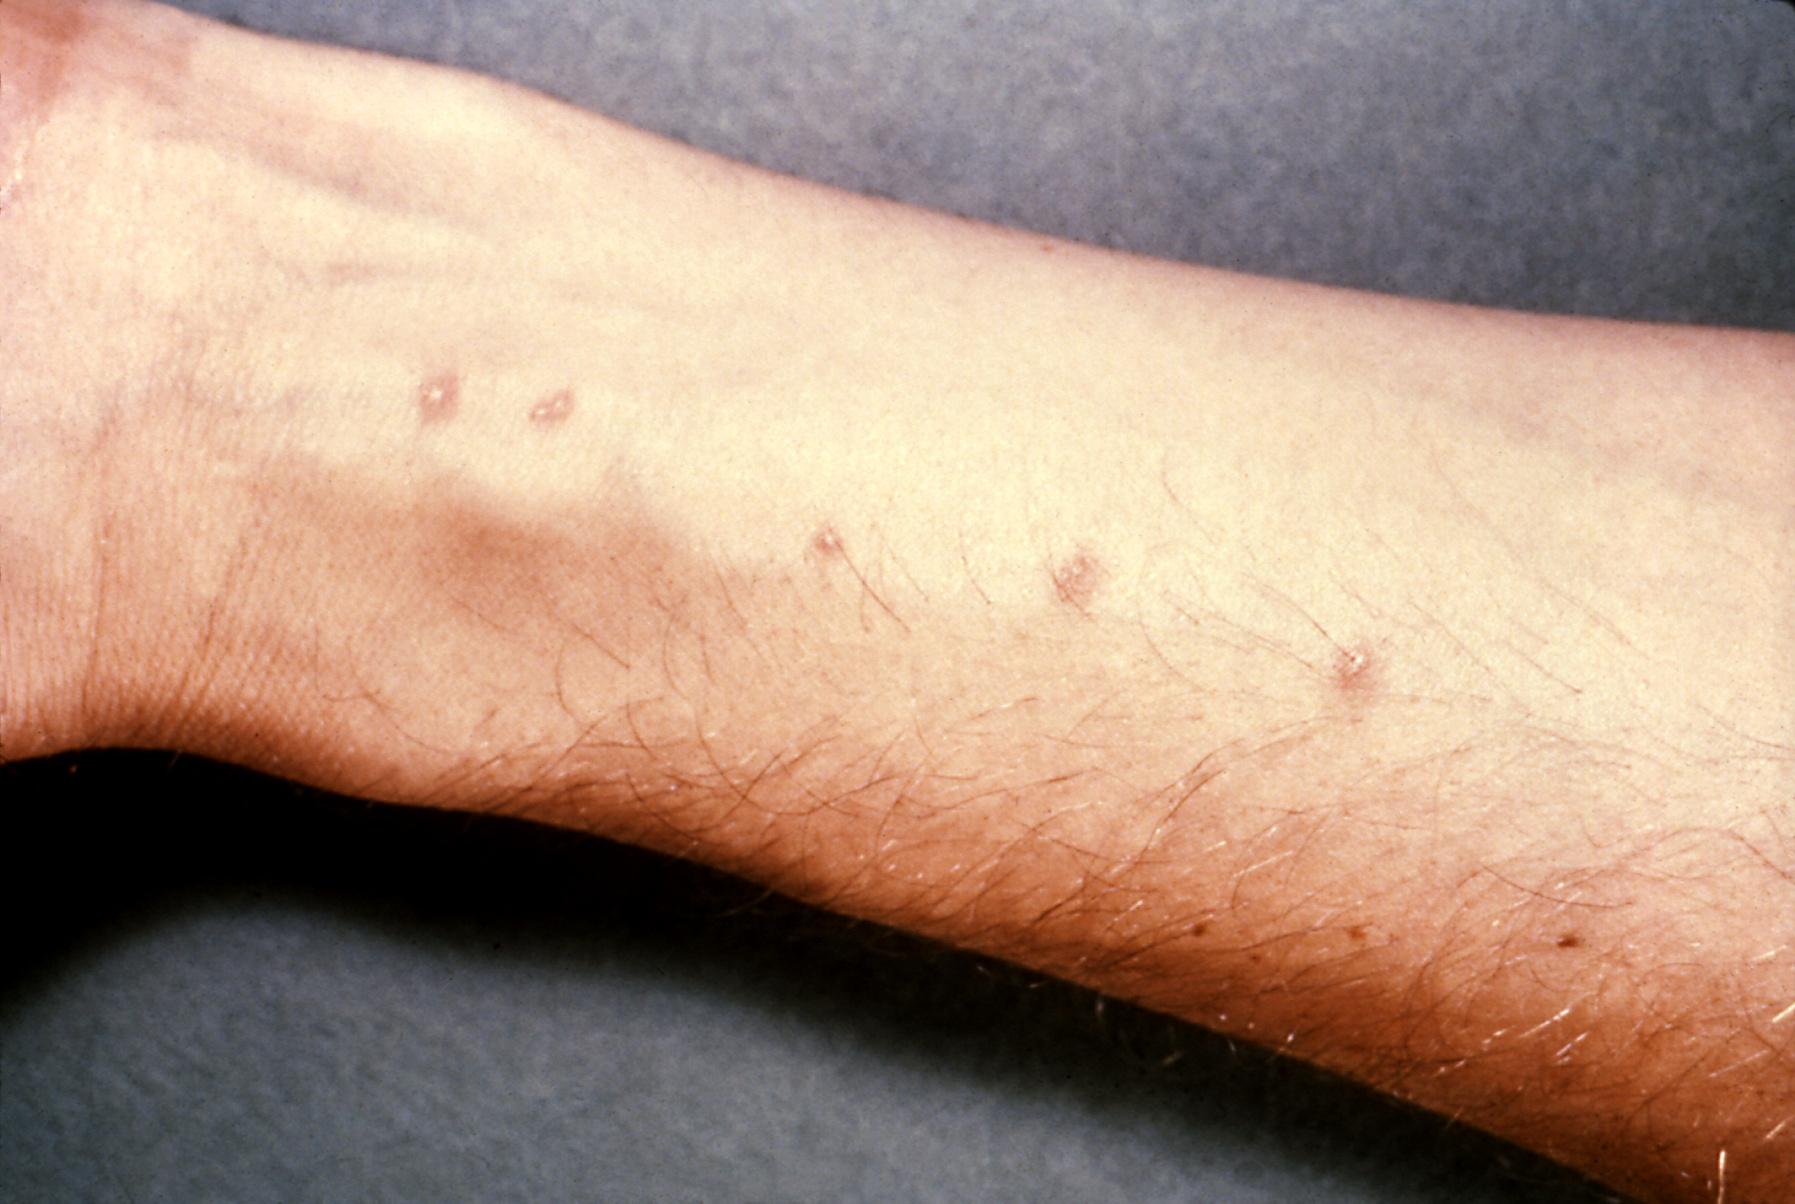 giardiasis dermatitis